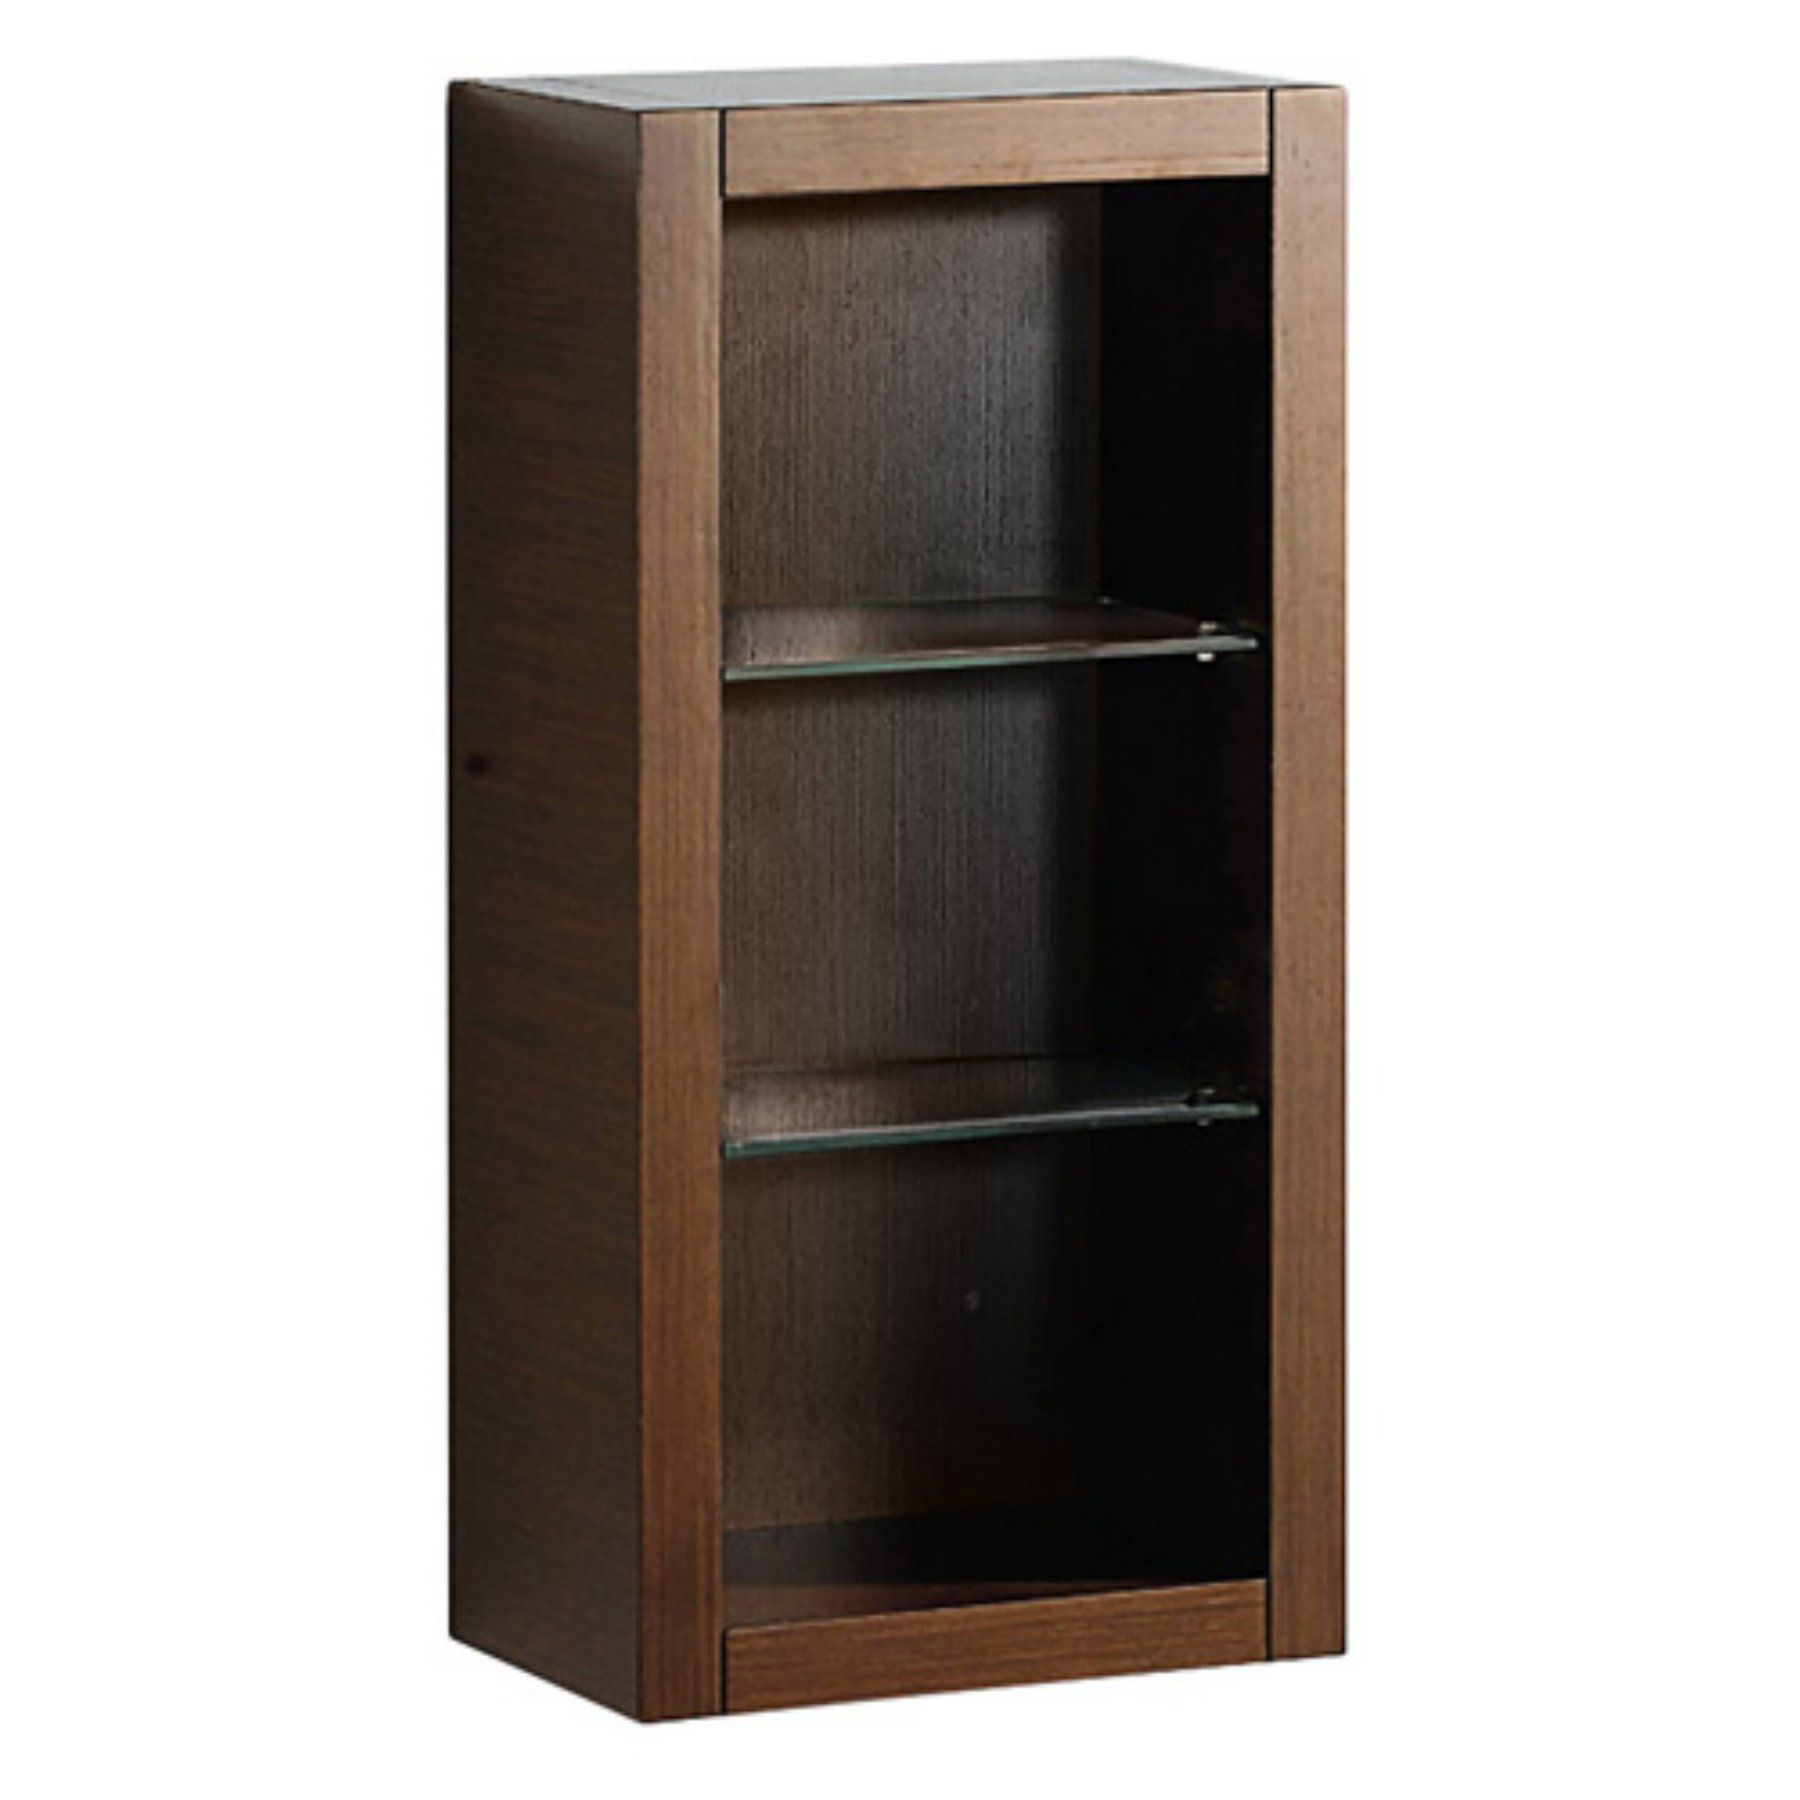 Fresca Bathroom Linen Side Cabinet with 2 Glass Shelves - FST8130GO